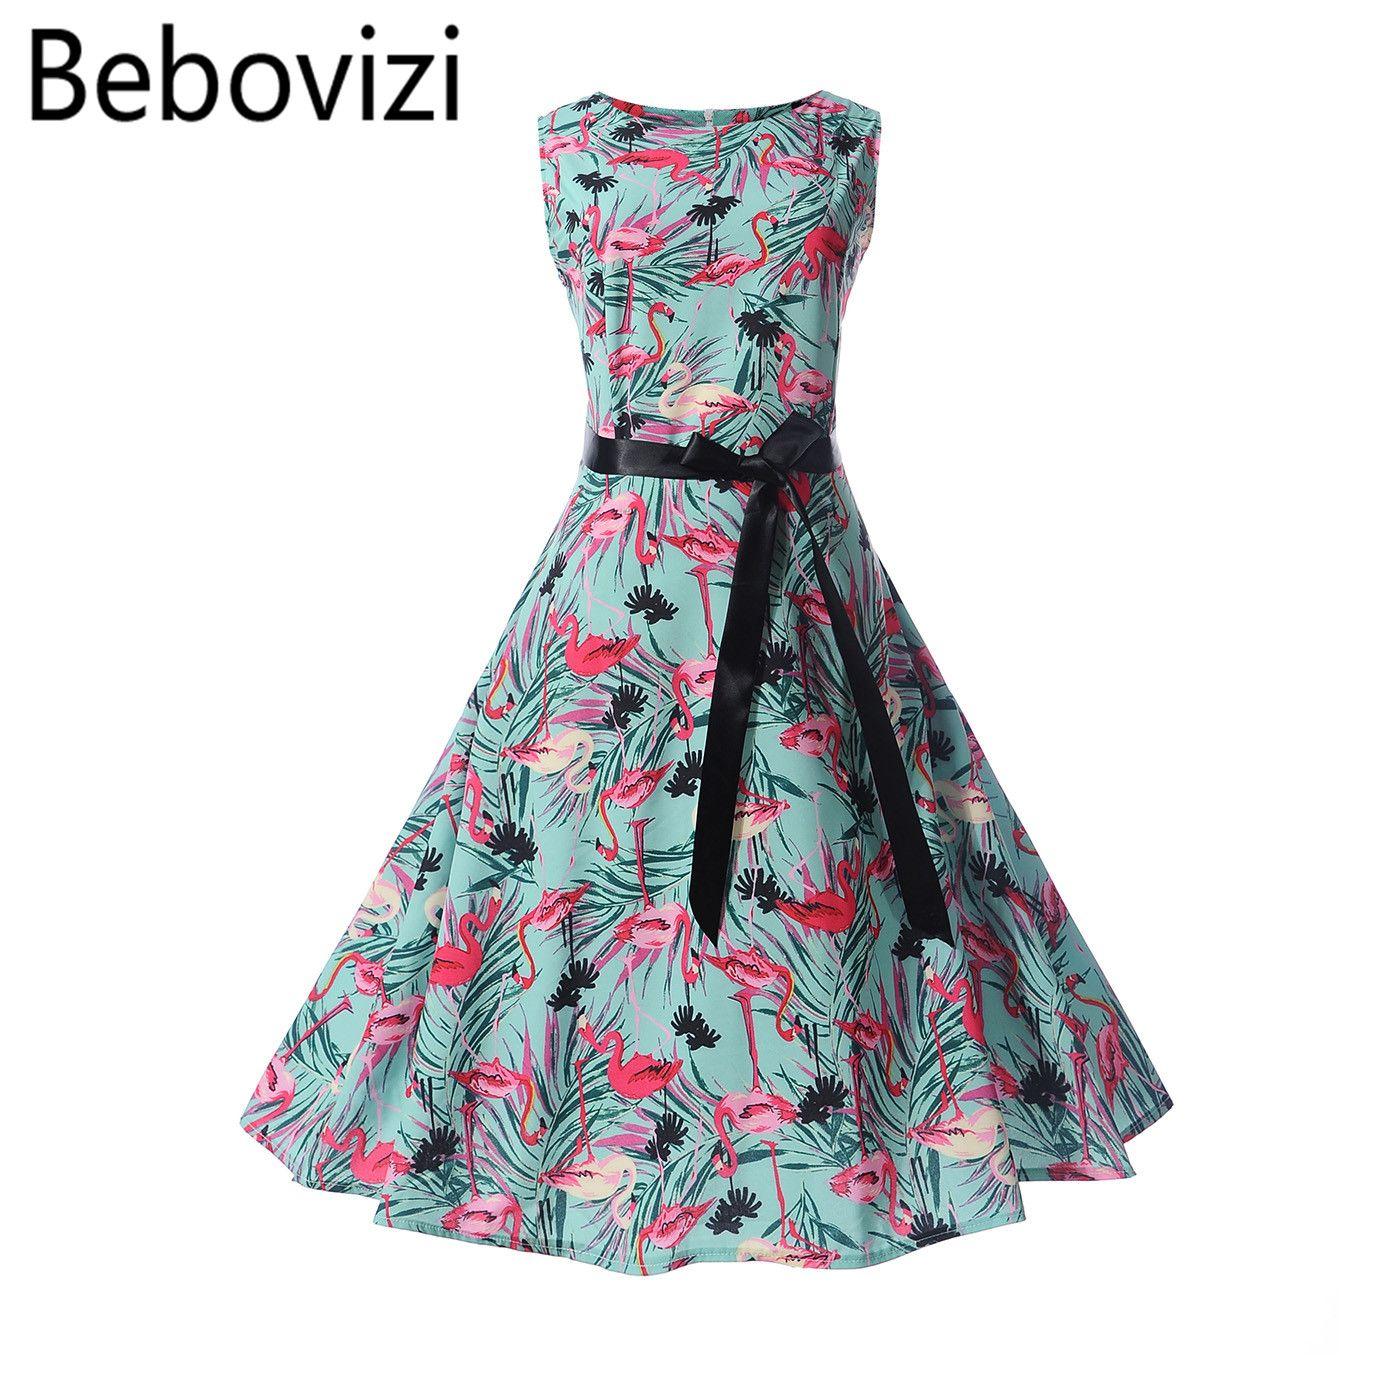 2018 Bebovizi Fashion Brand Flamingo Printing Hepburn Vintage Retro ...